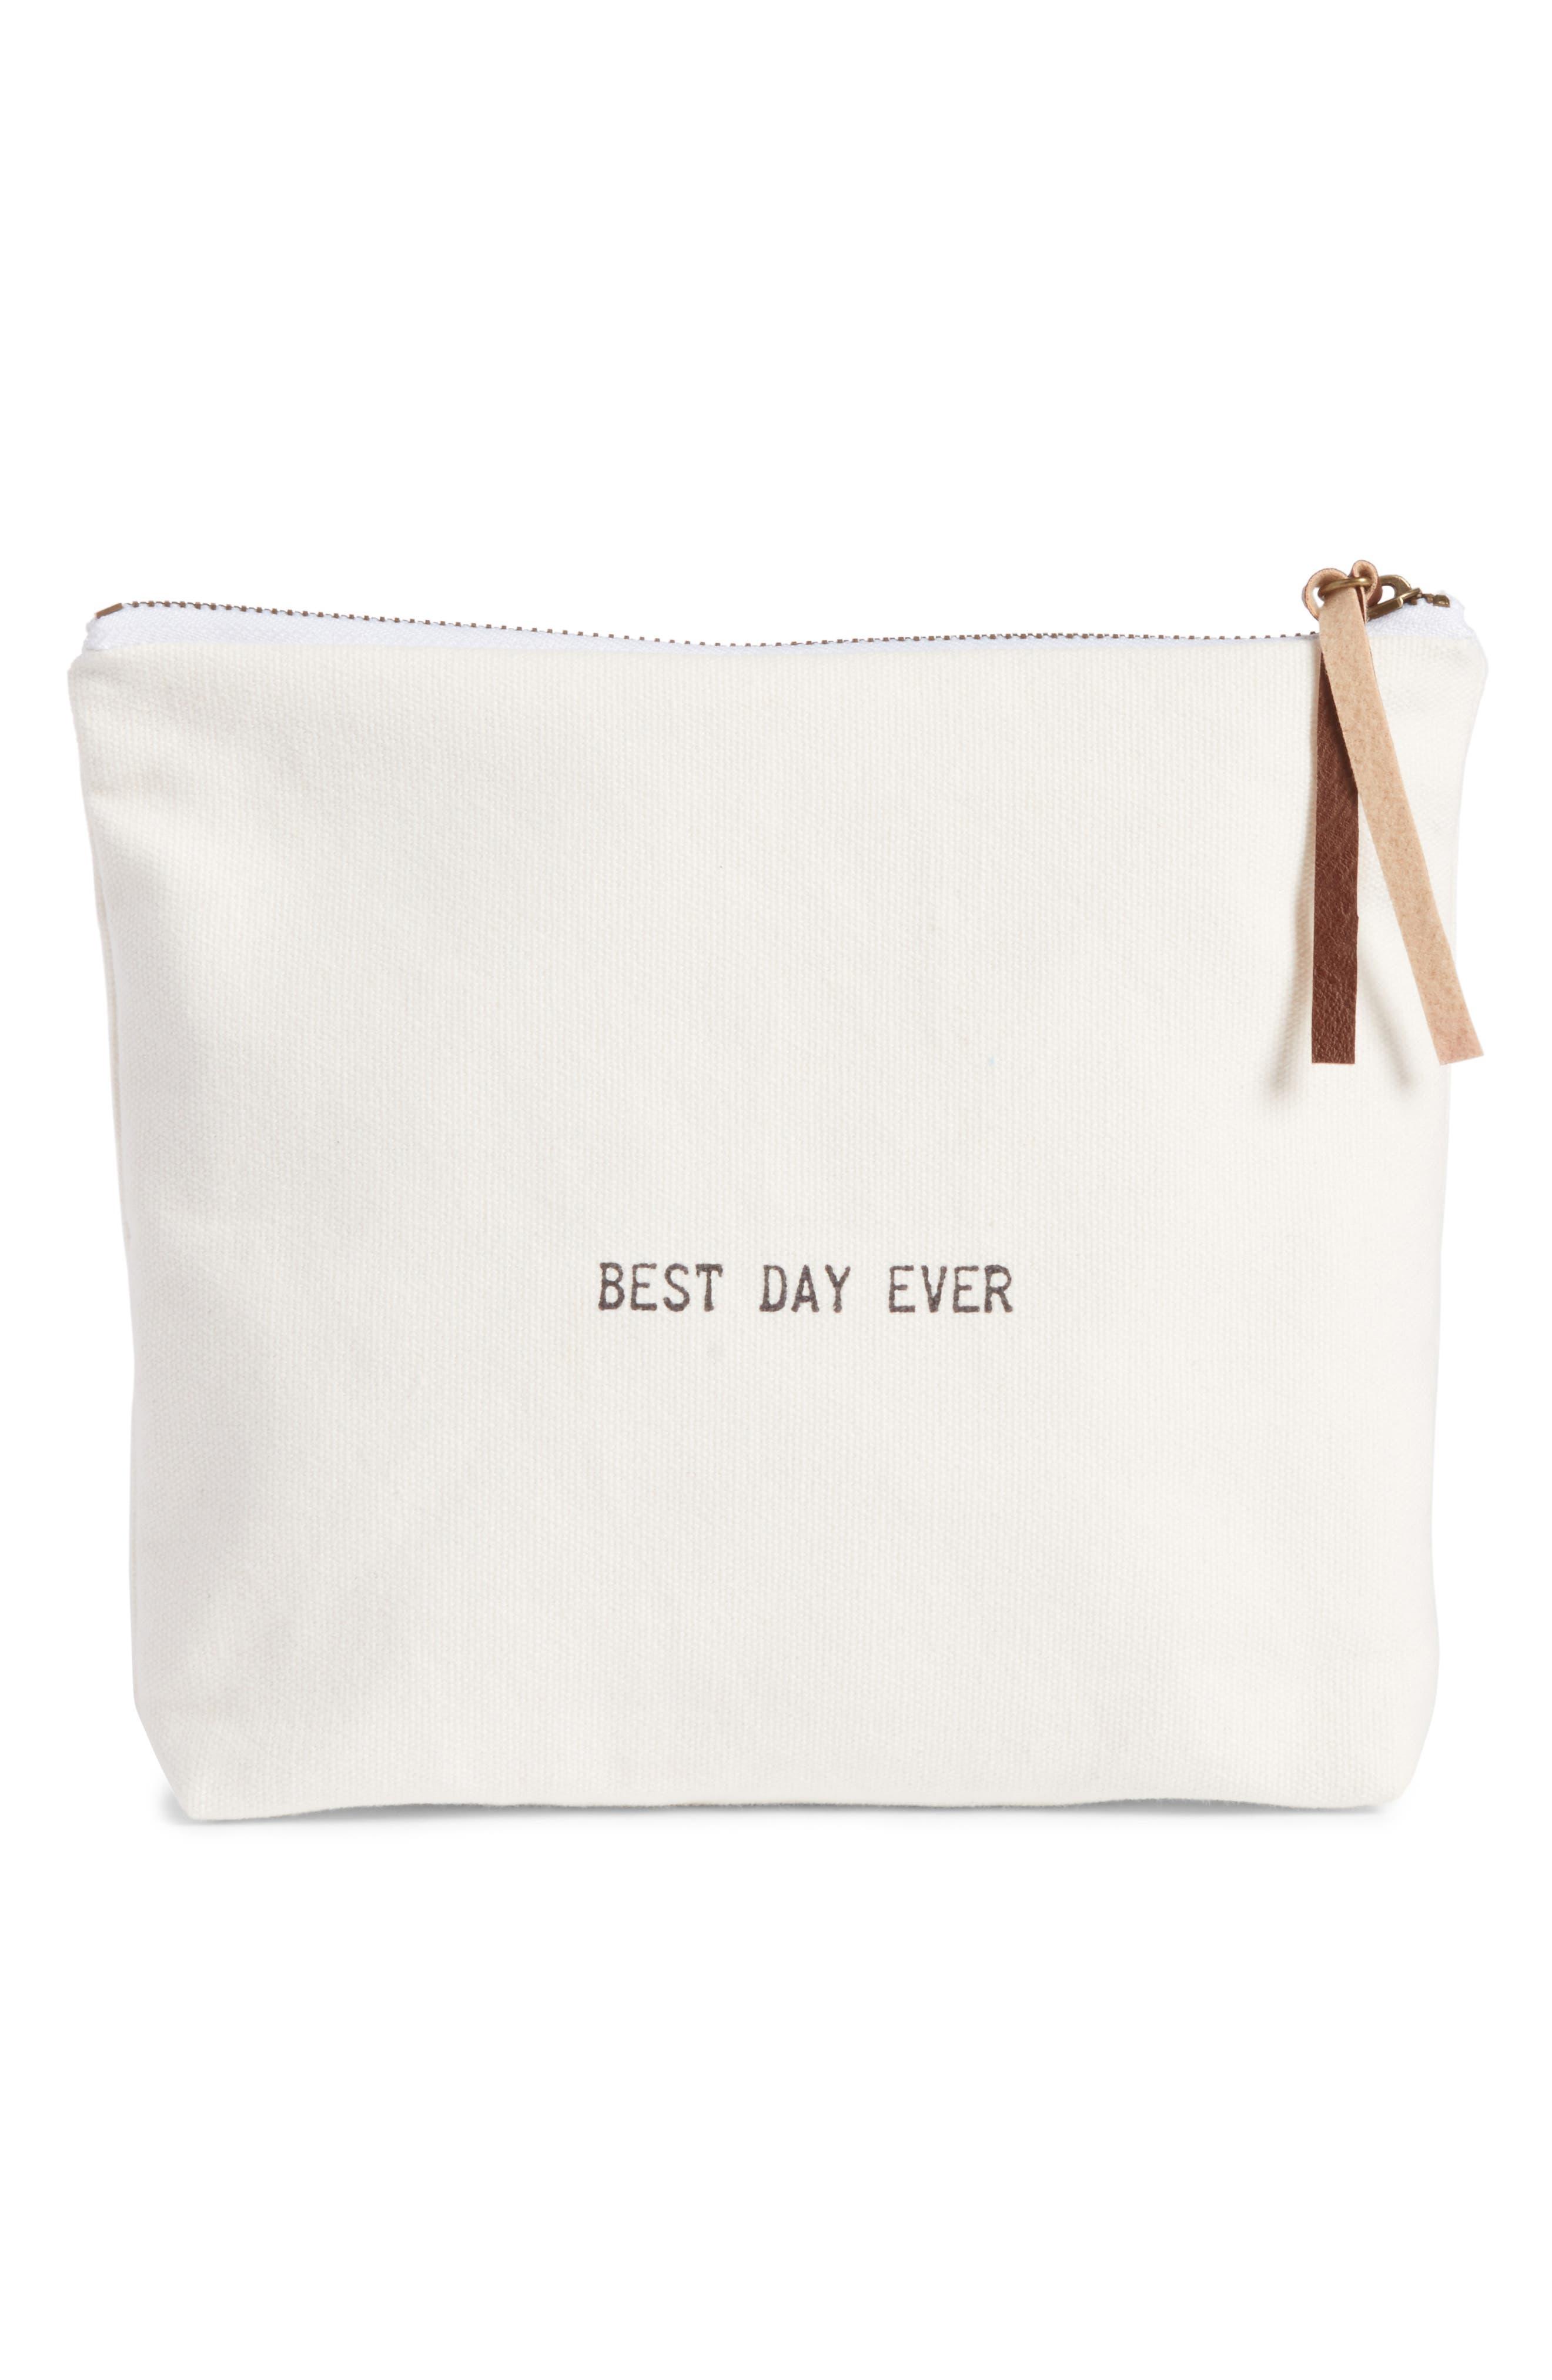 LEVTEX Best Day Ever Zip Top Accessory Bag